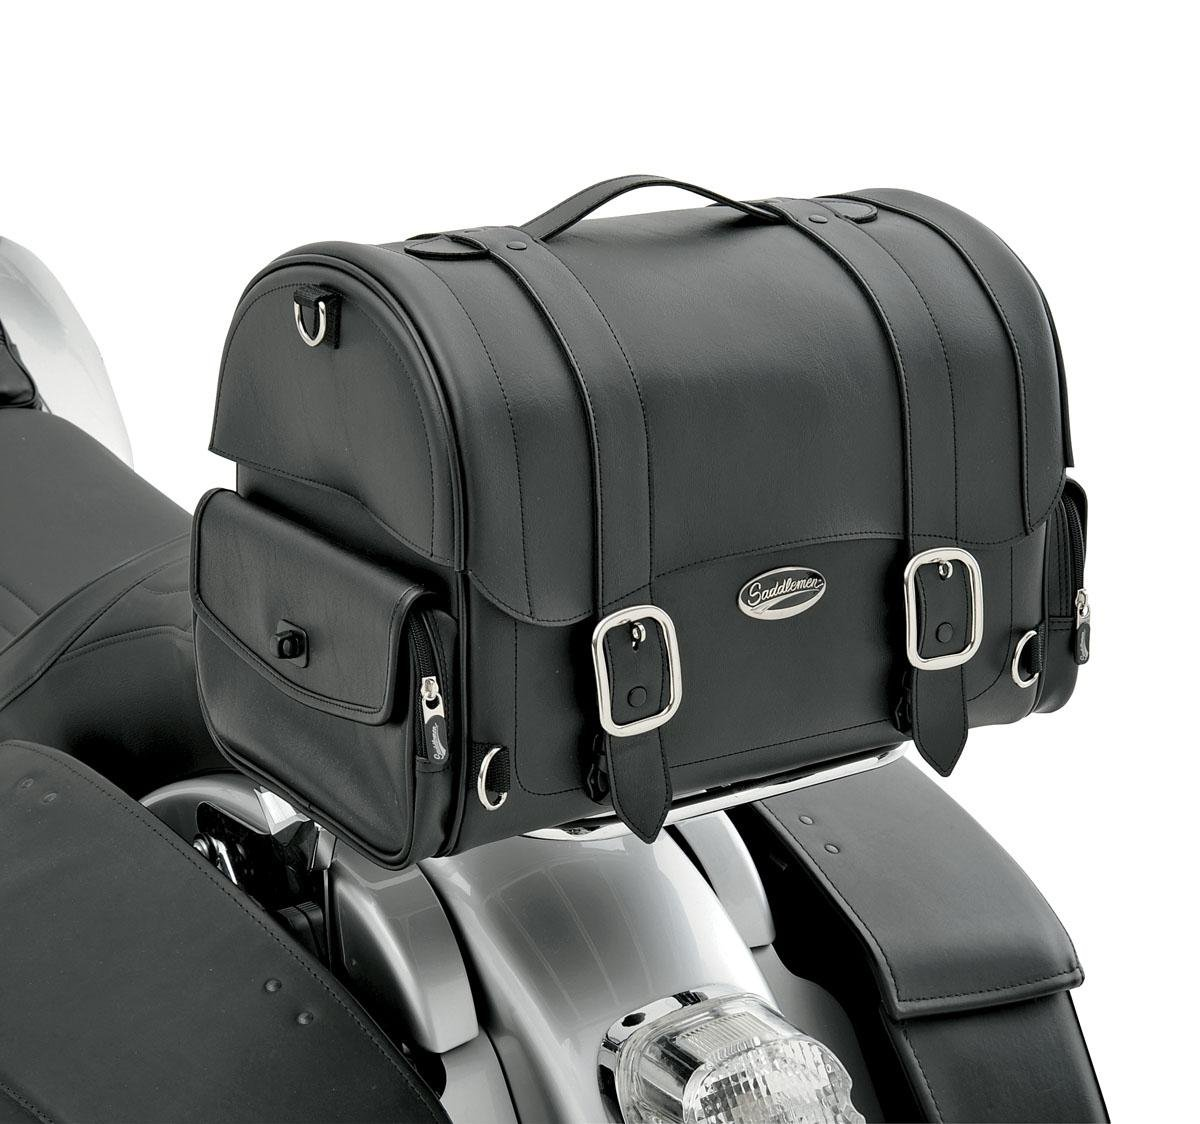 Saddlemen Drifter Express sacoche moto pour sissy bar 3503-0055 106246-1